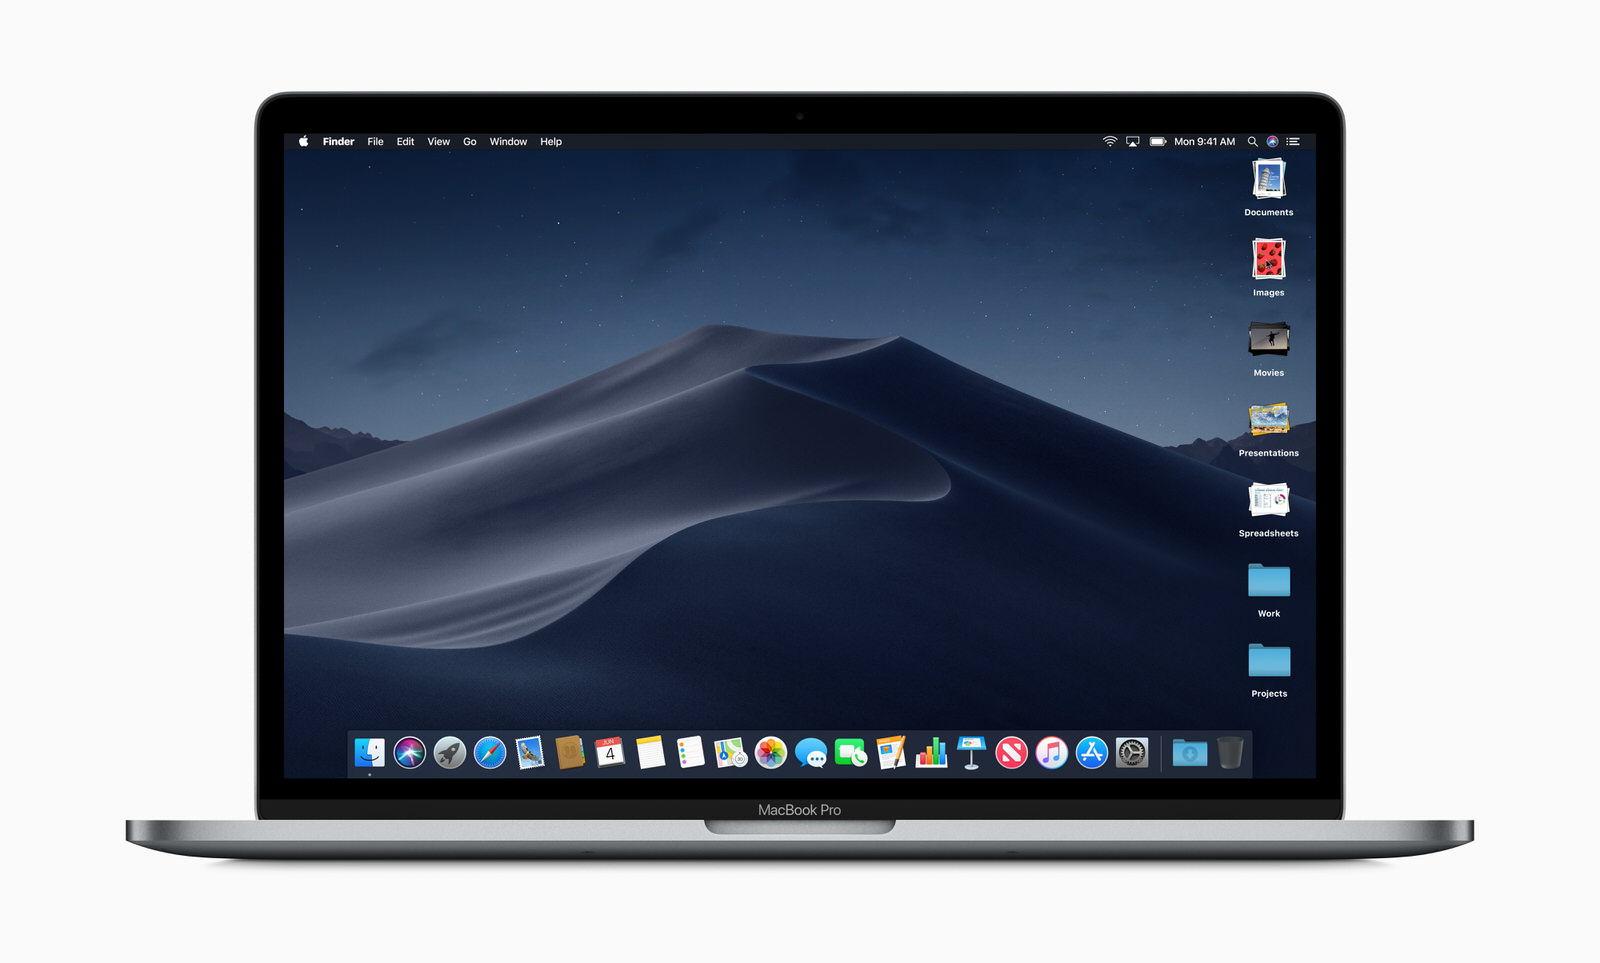 MacBook Mac Mini Apple EFI la password iCloud di sgancio strumento iMac MacBook Pro